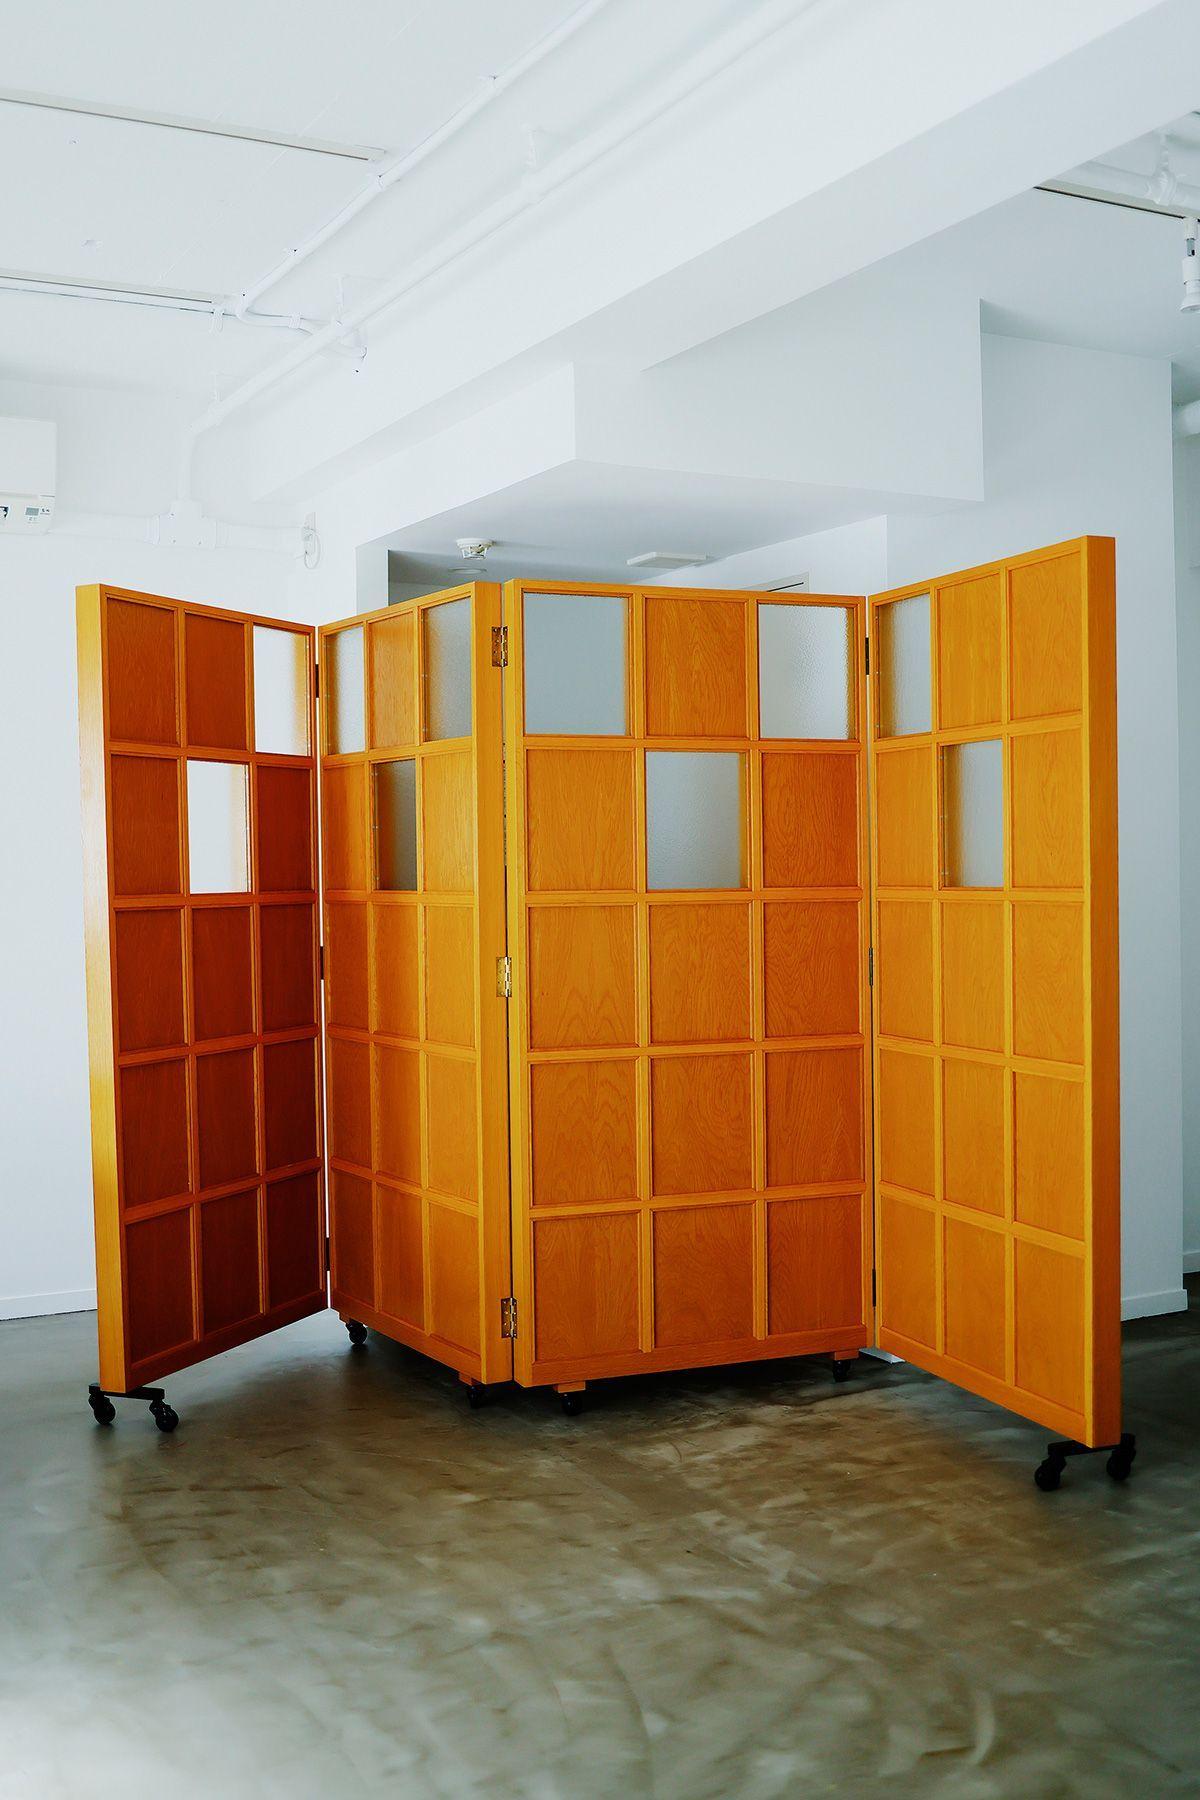 STUDIO LILLARD (スタジオ リラード)可動式ビンテージパーテーション有